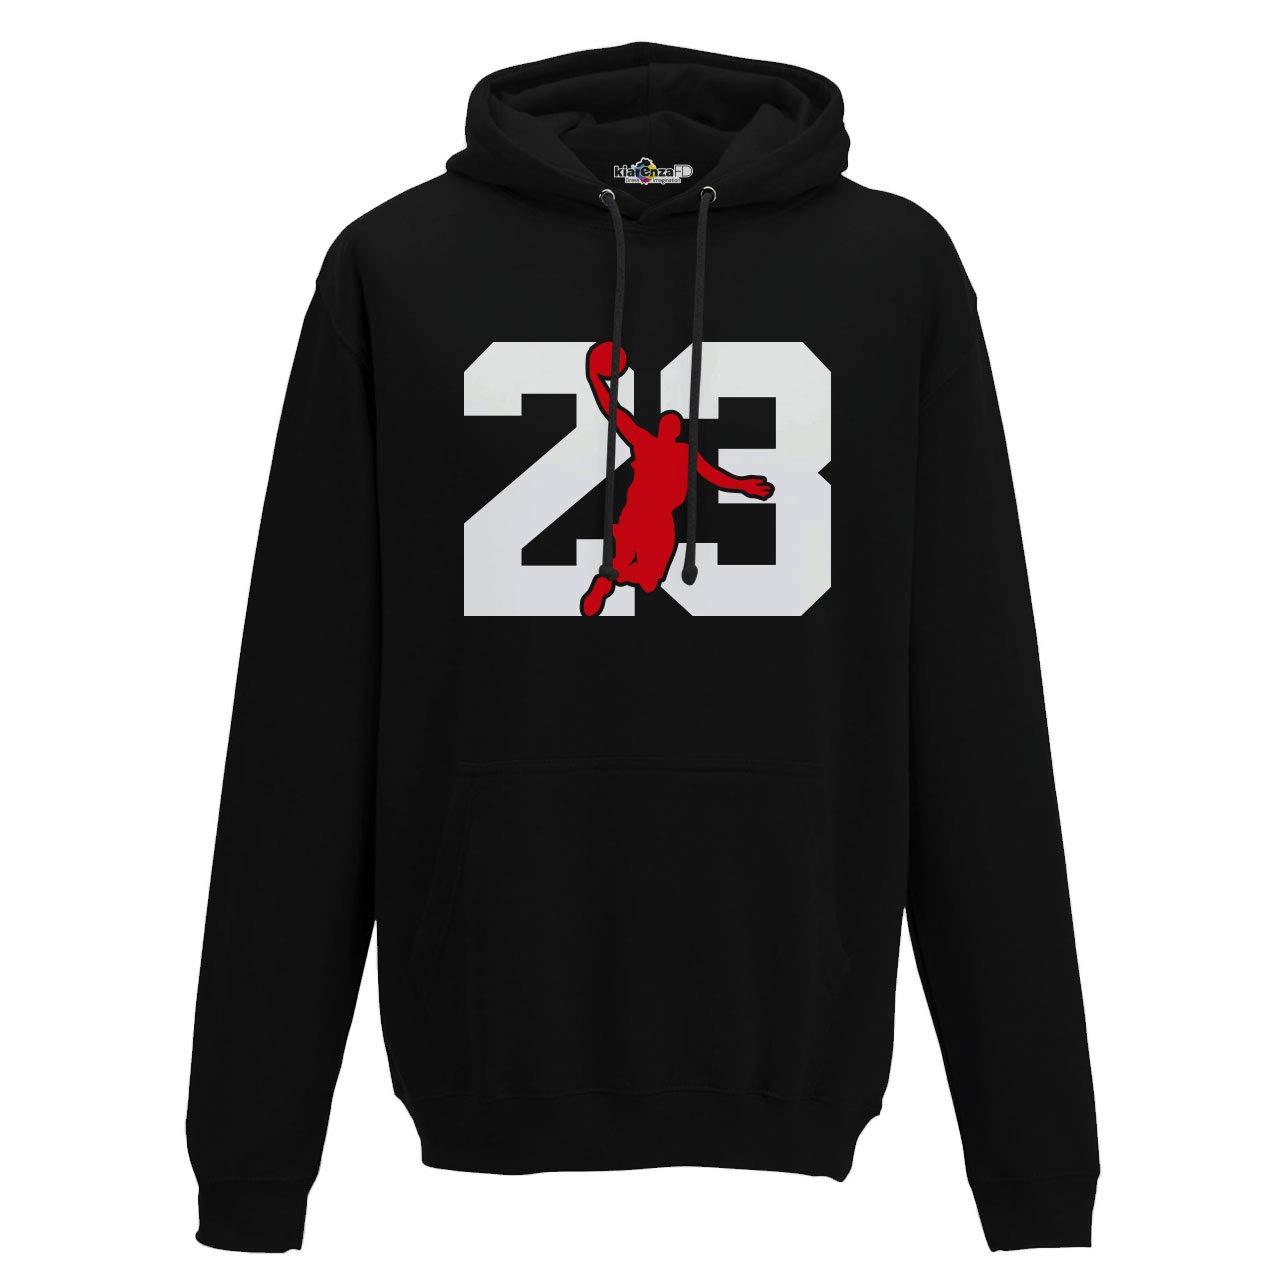 Sport Heroes Evolution Chicago 23 Nera Shirts